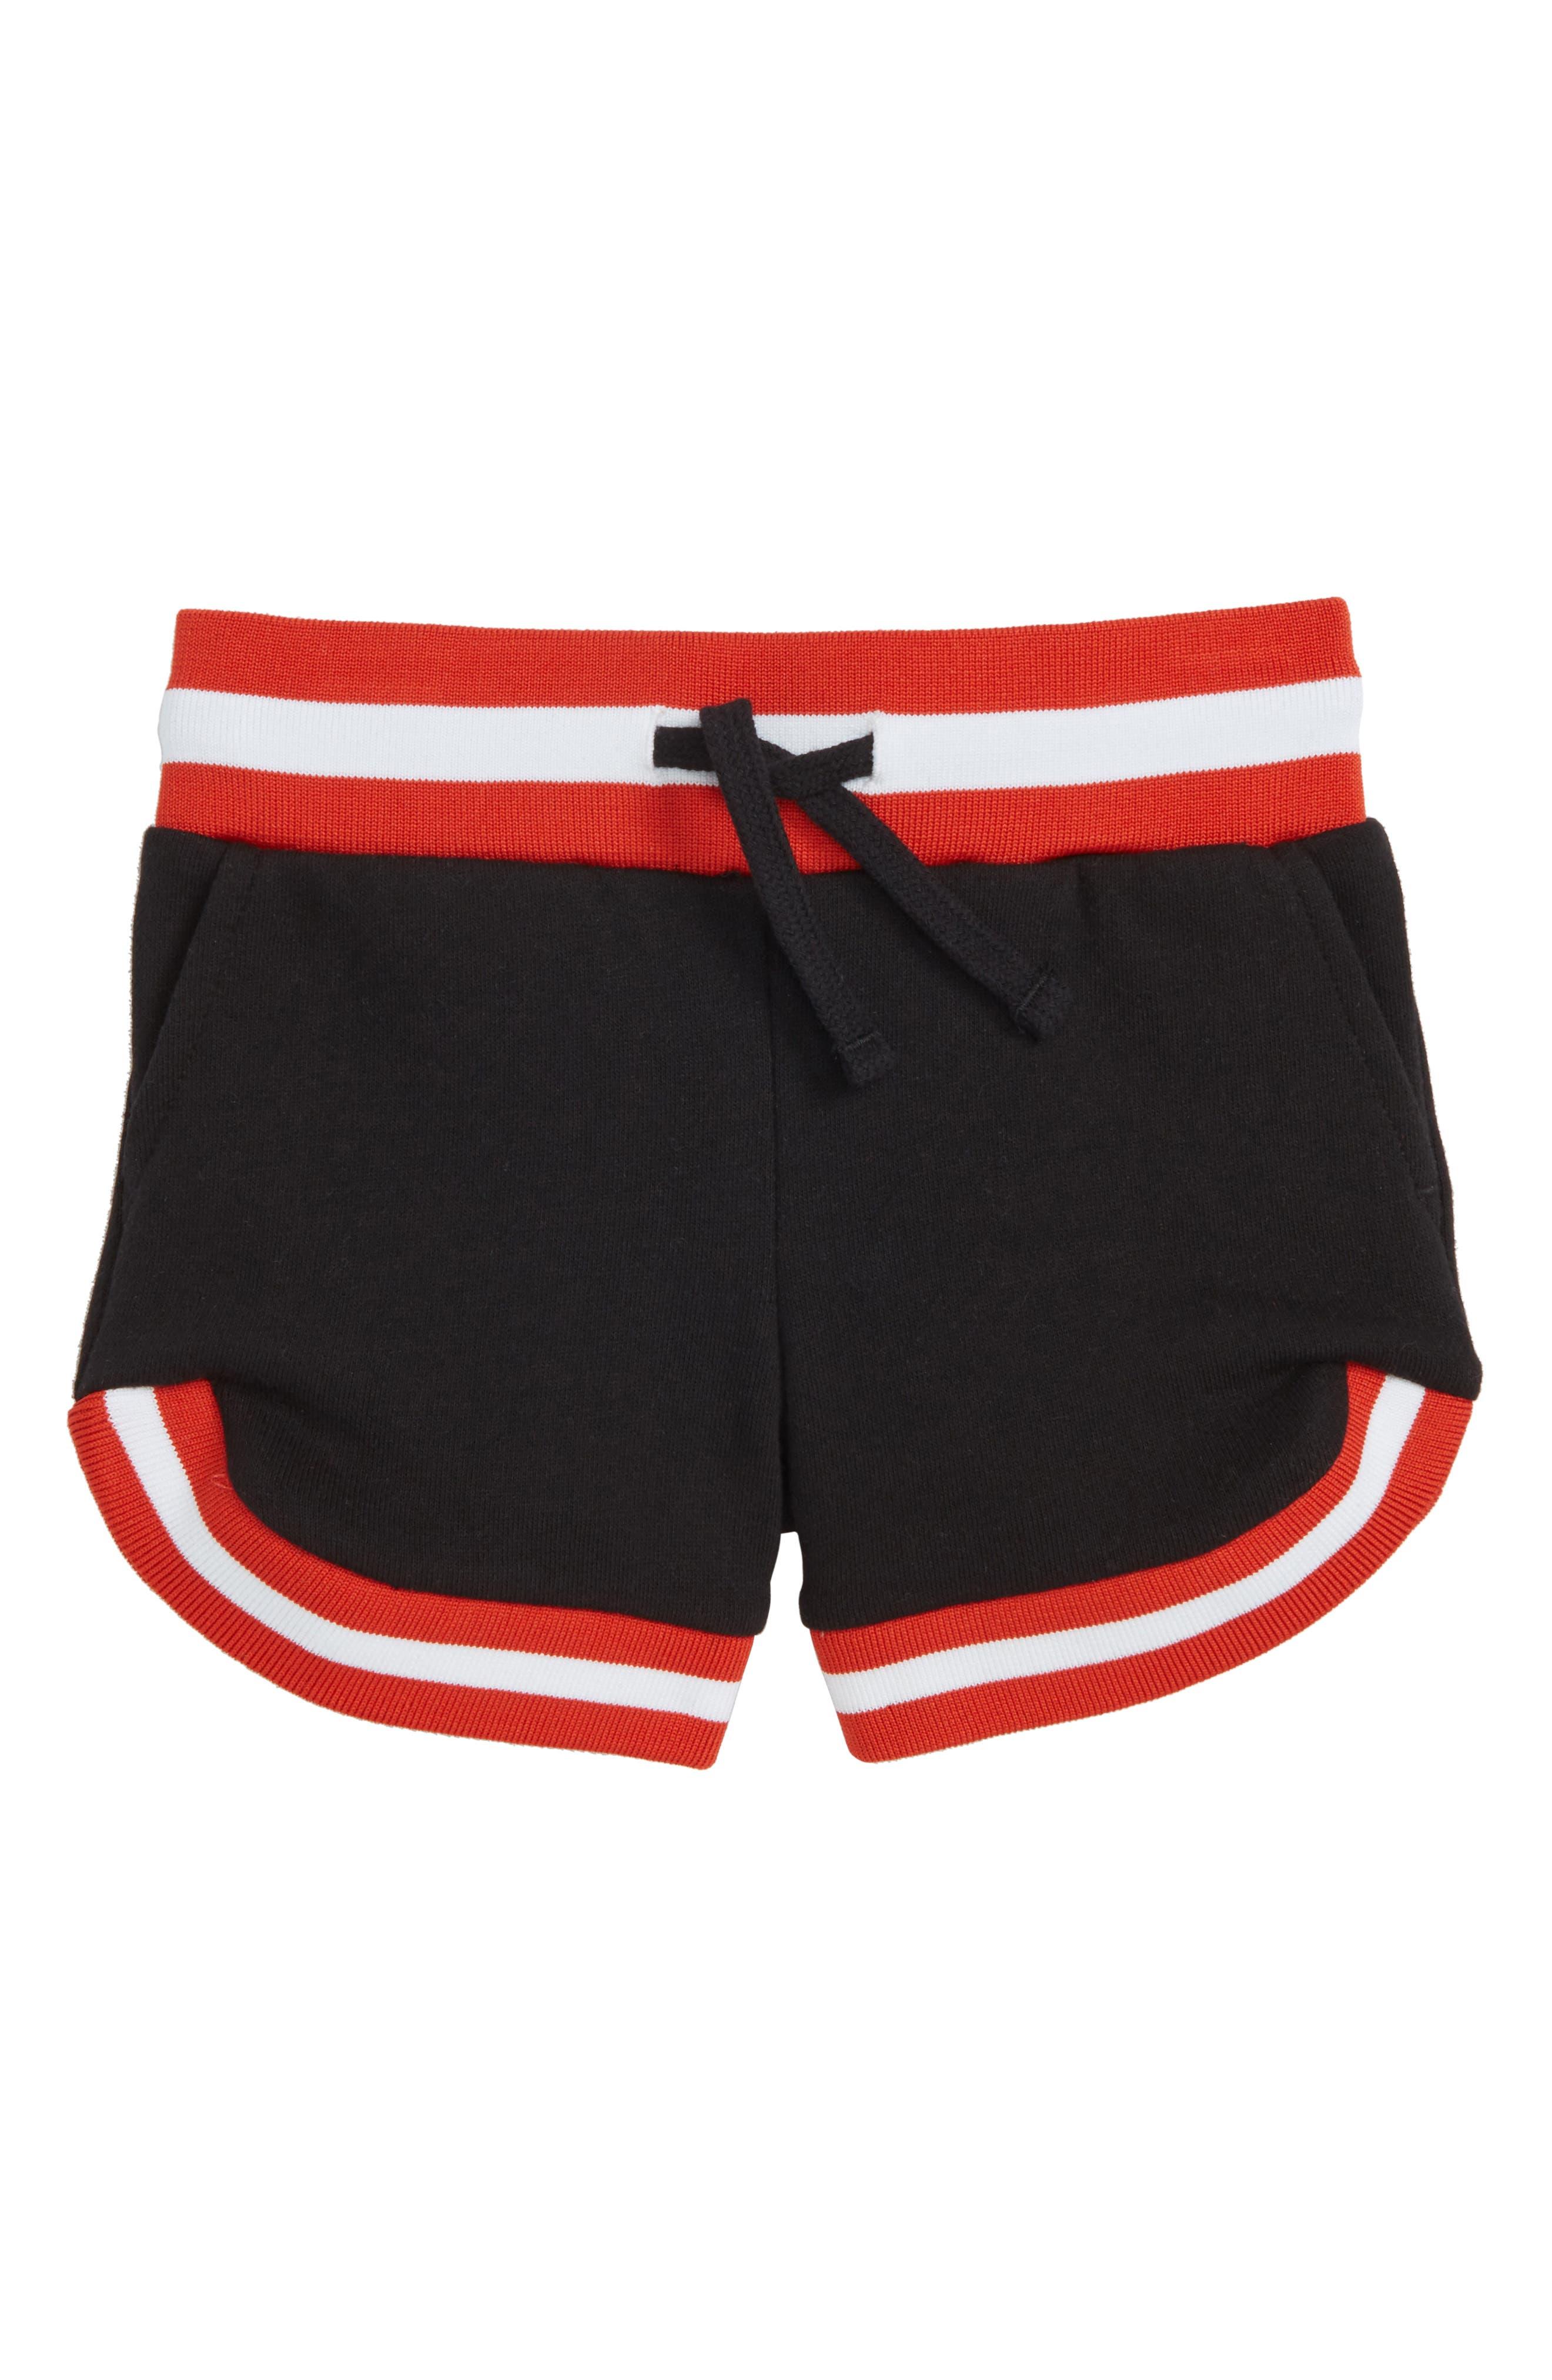 Delilah Shorts,                         Main,                         color, Black